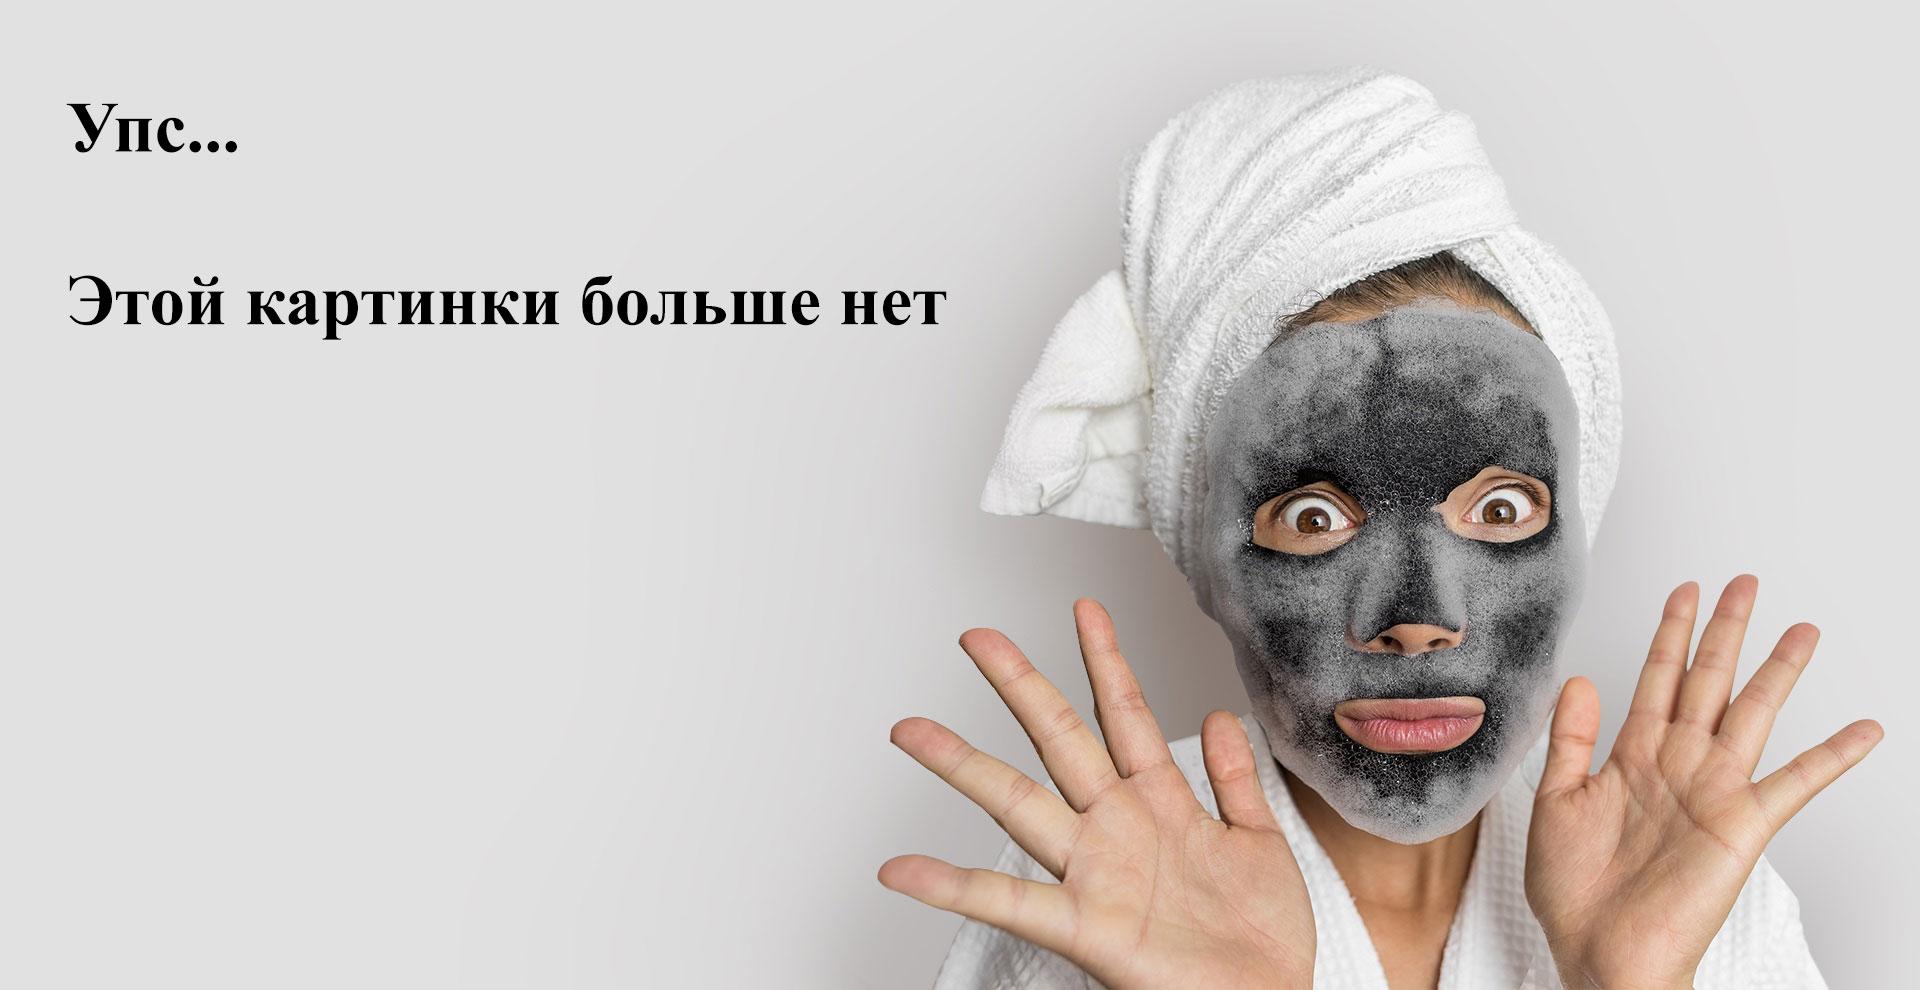 Patrisa Nail, Гель-лак Московская сага №768